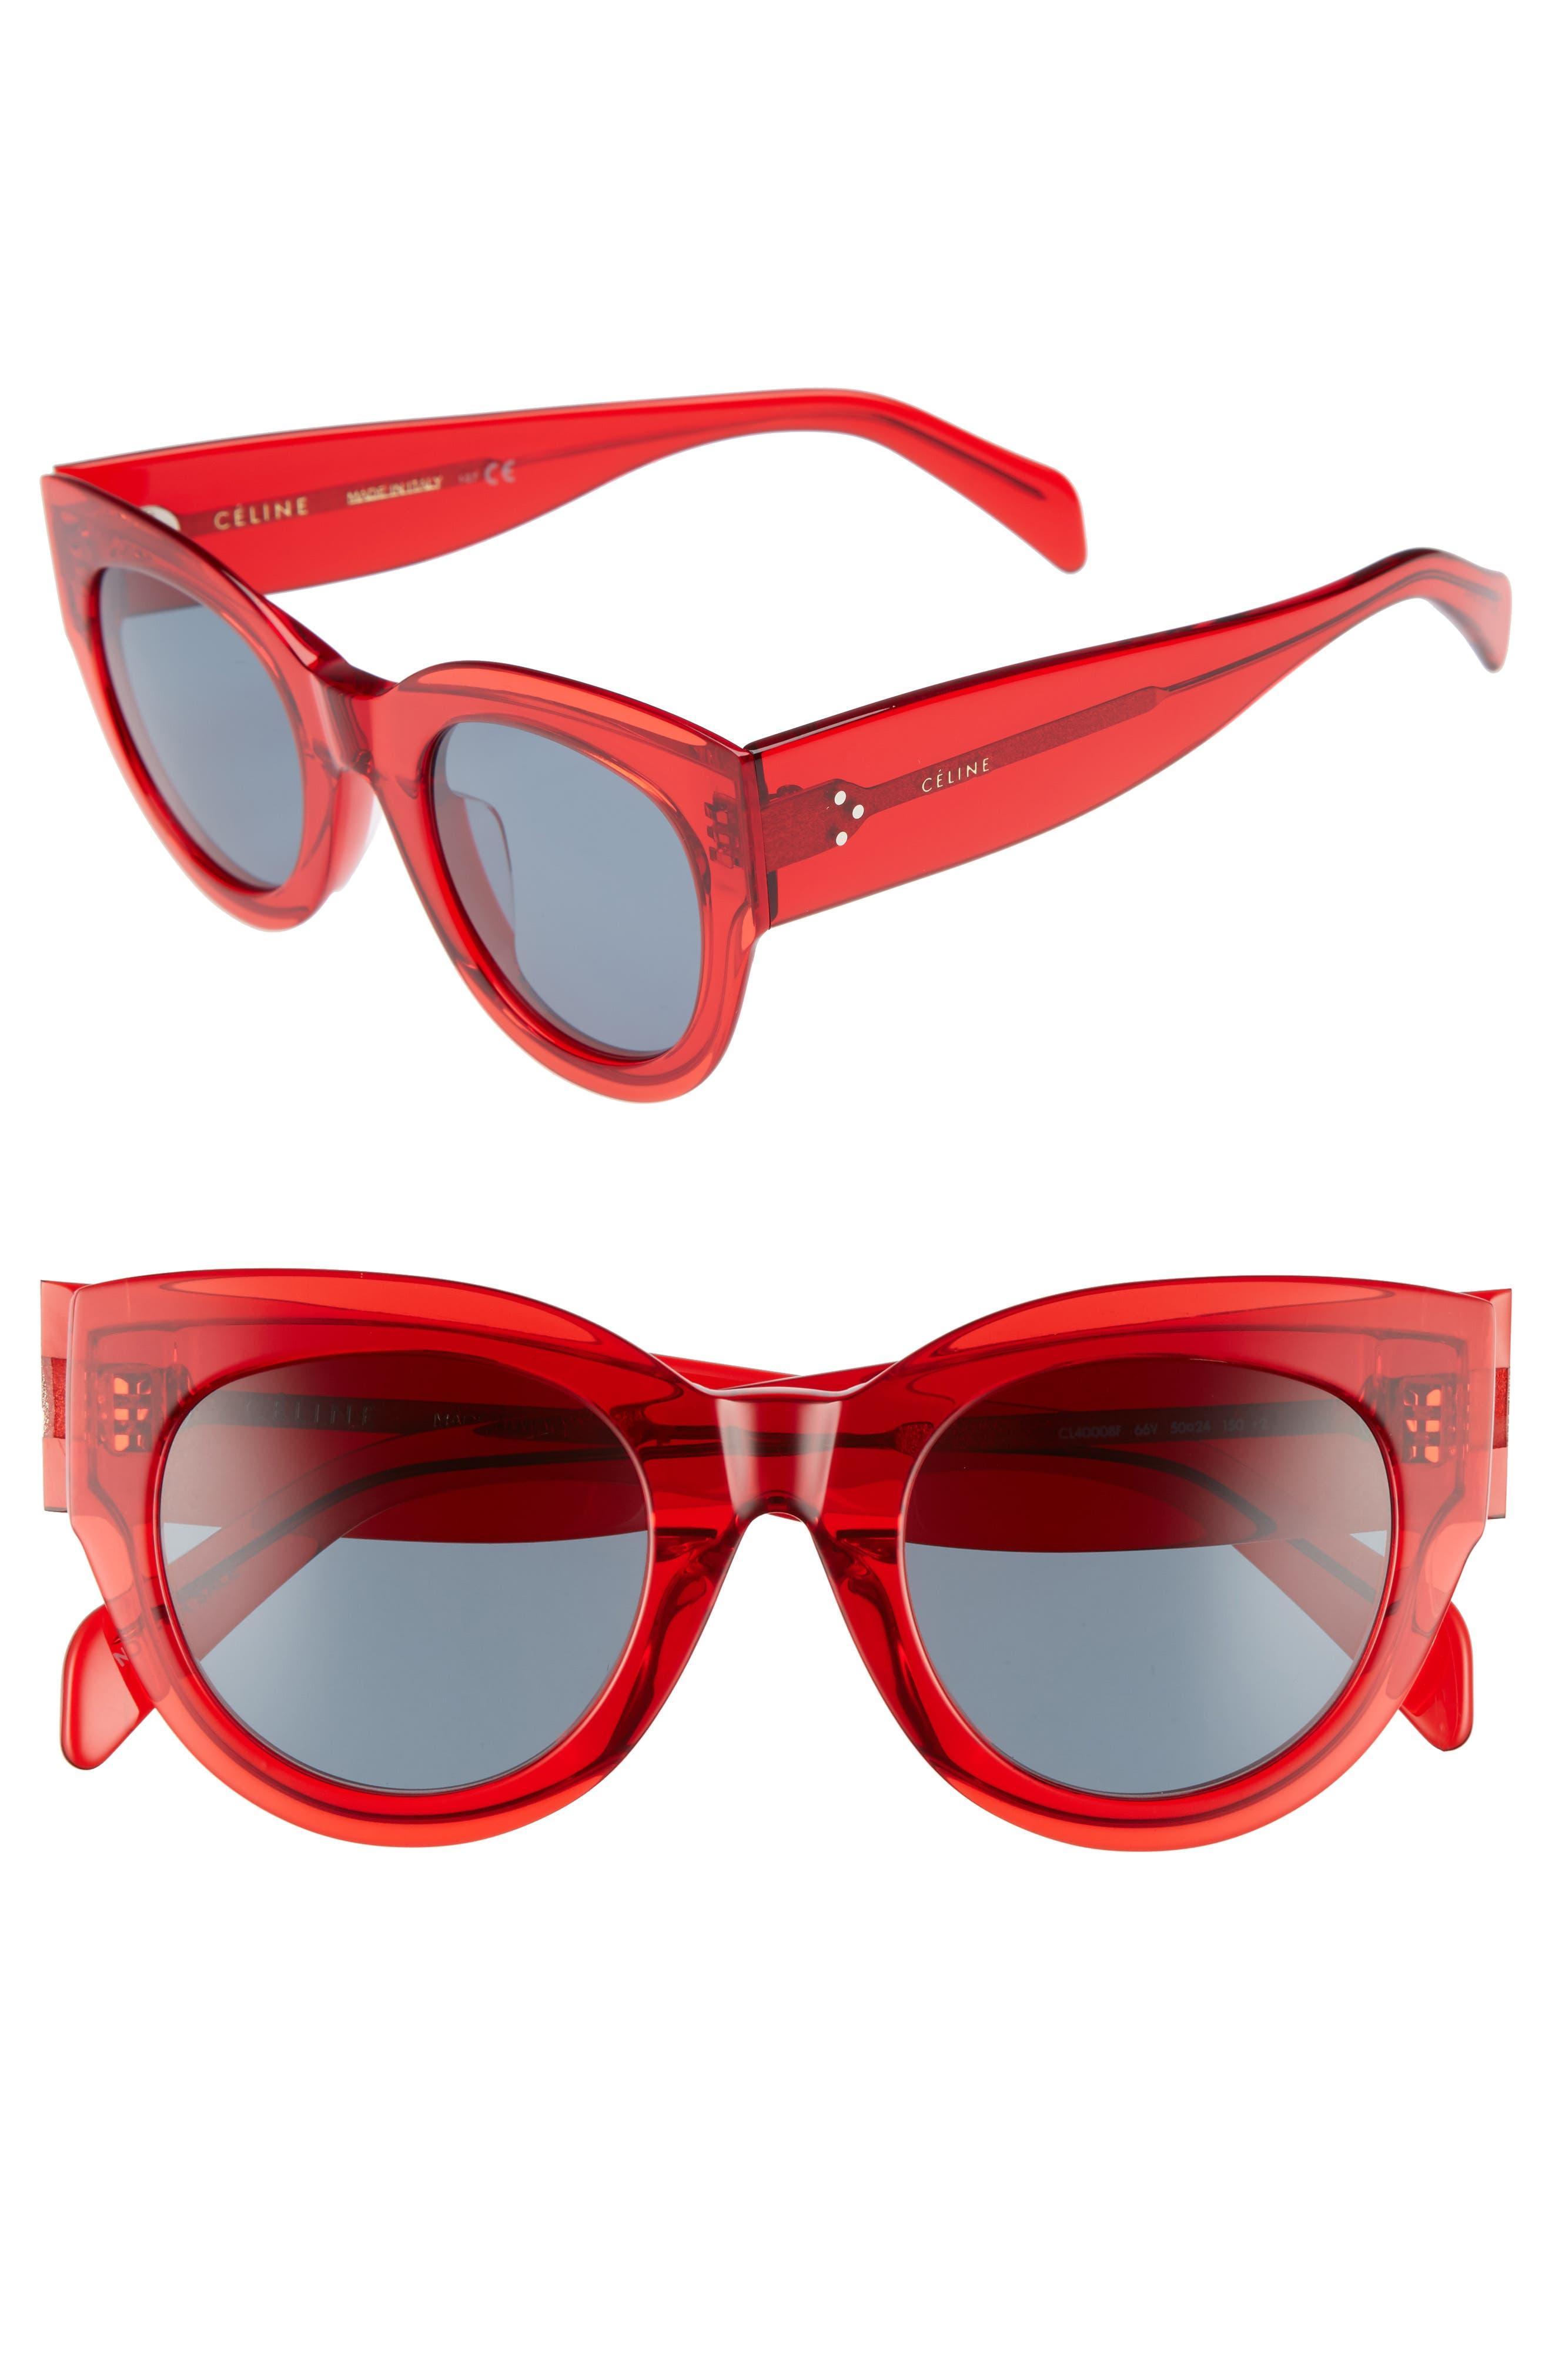 Céline Special Fit 50mm Cat Eye Sunglasses